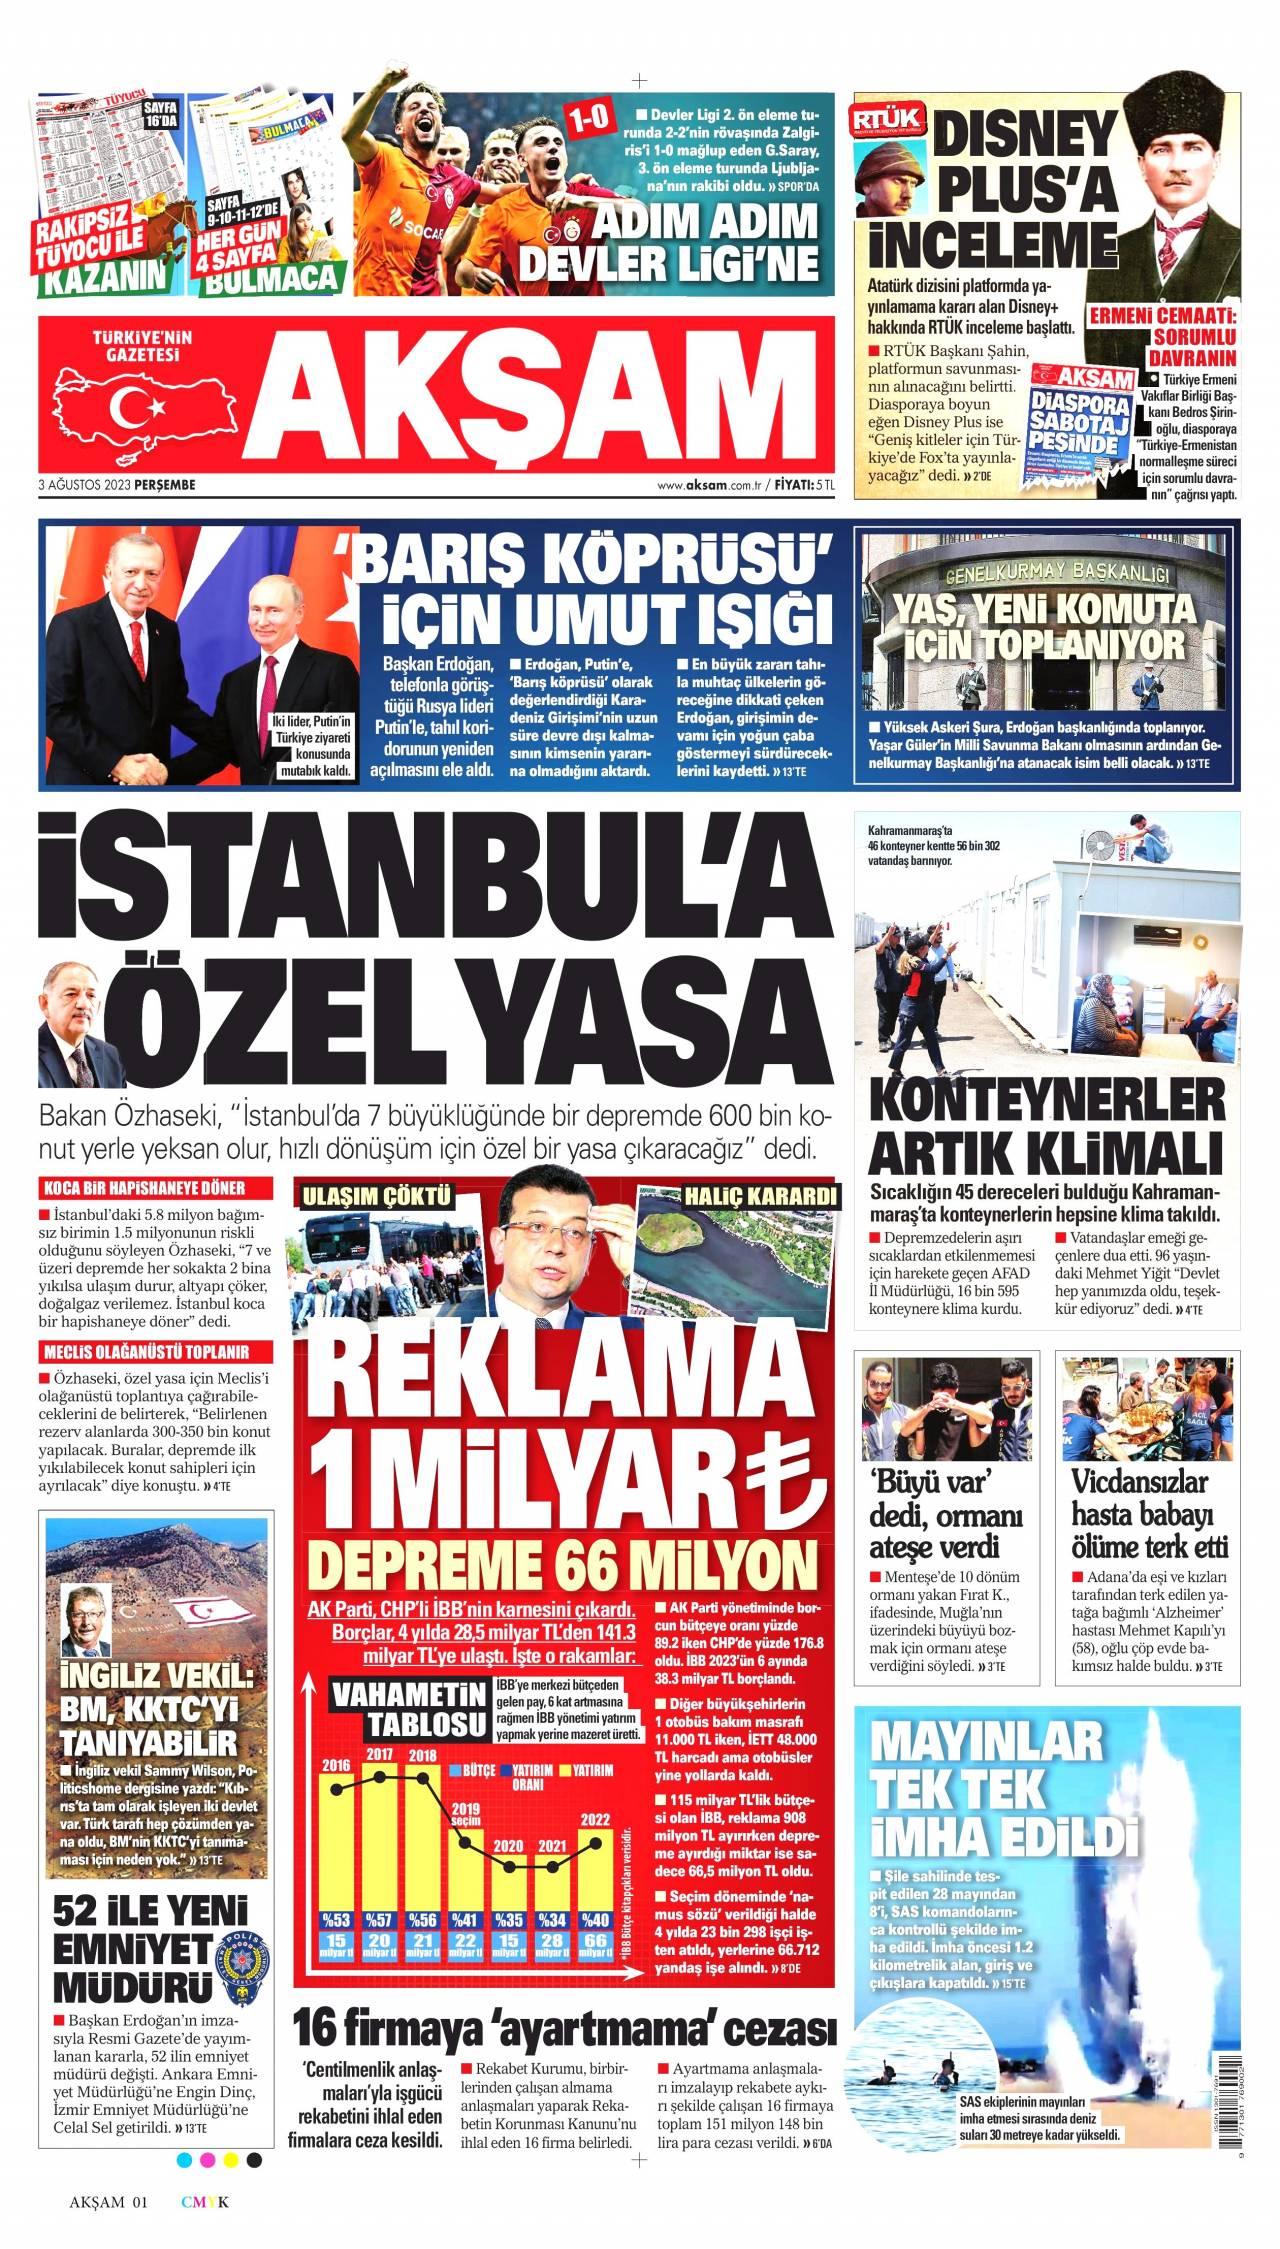 22 Ocak 2020, Çarşamba aksam Gazetesi